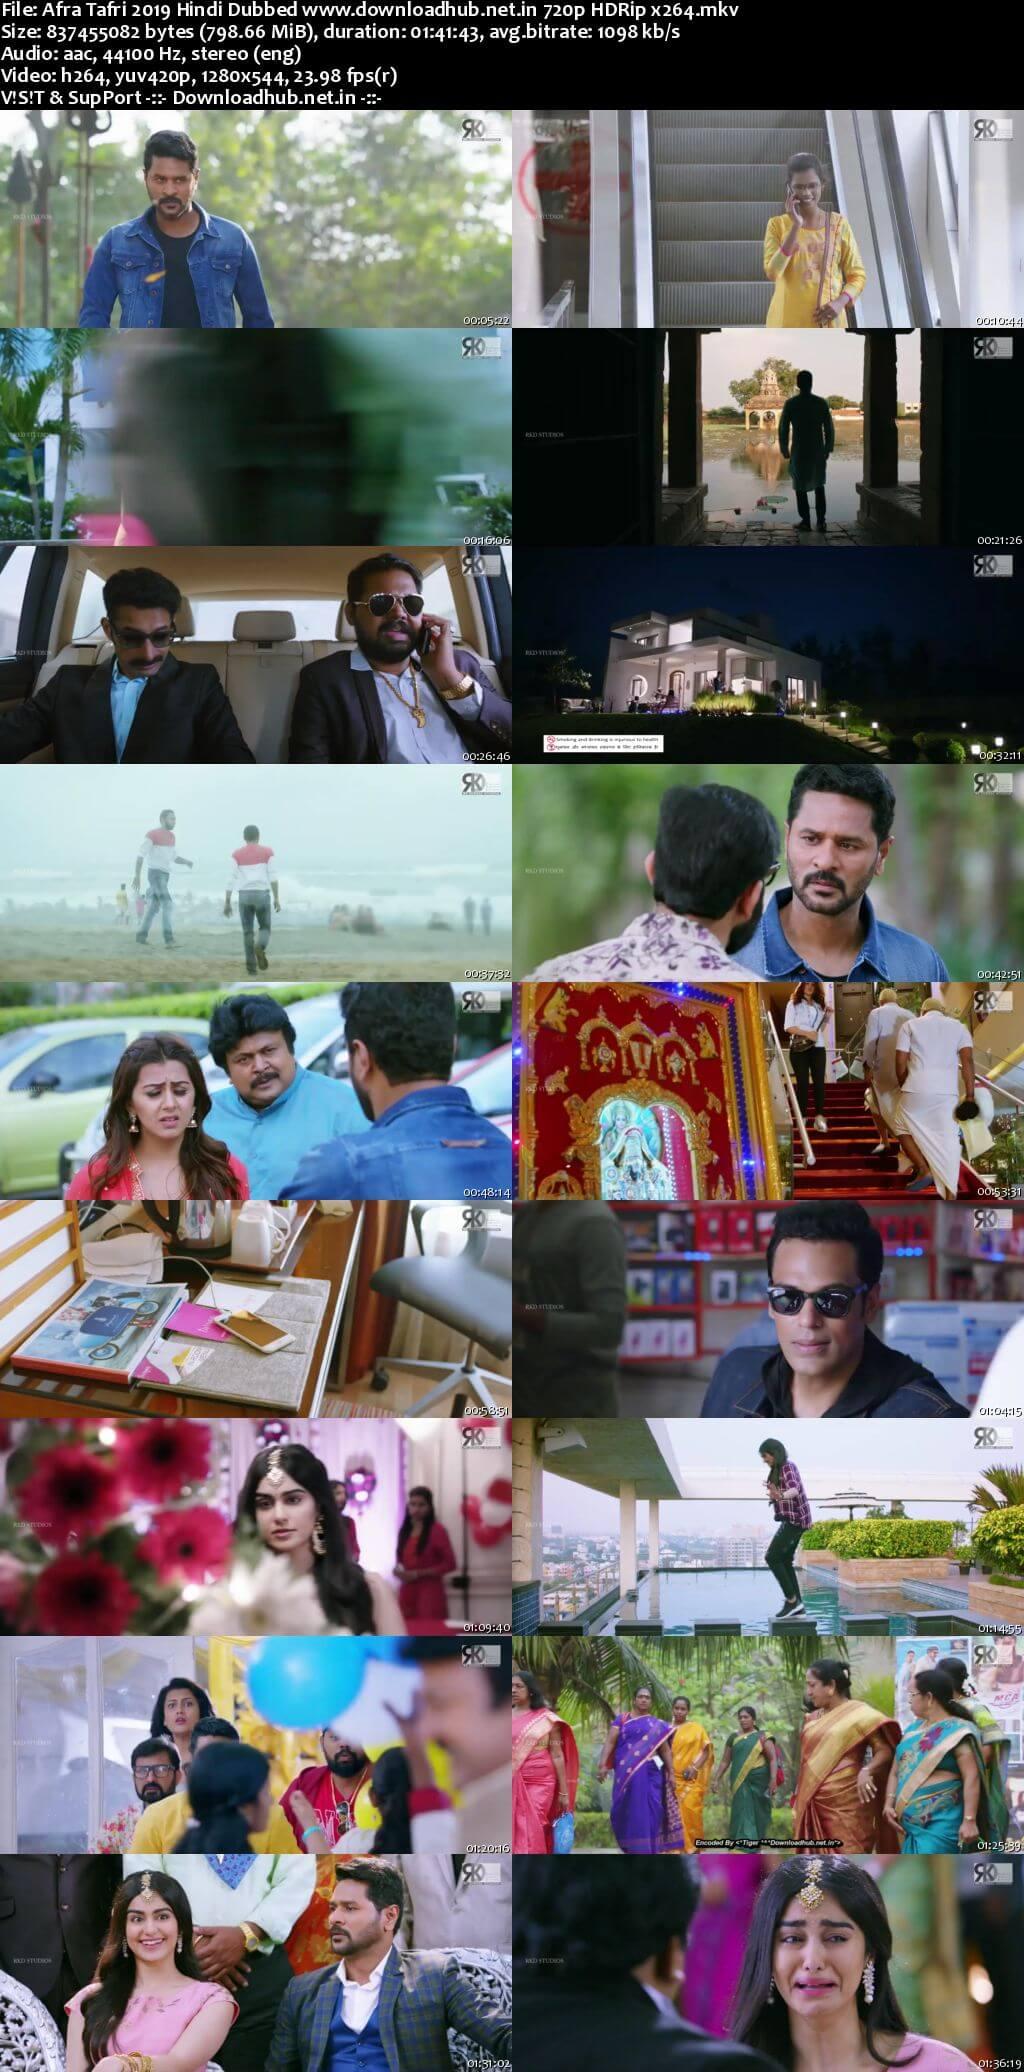 Download Afra Tafri 2019 Hindi Dubbed Movie 720p HDRip